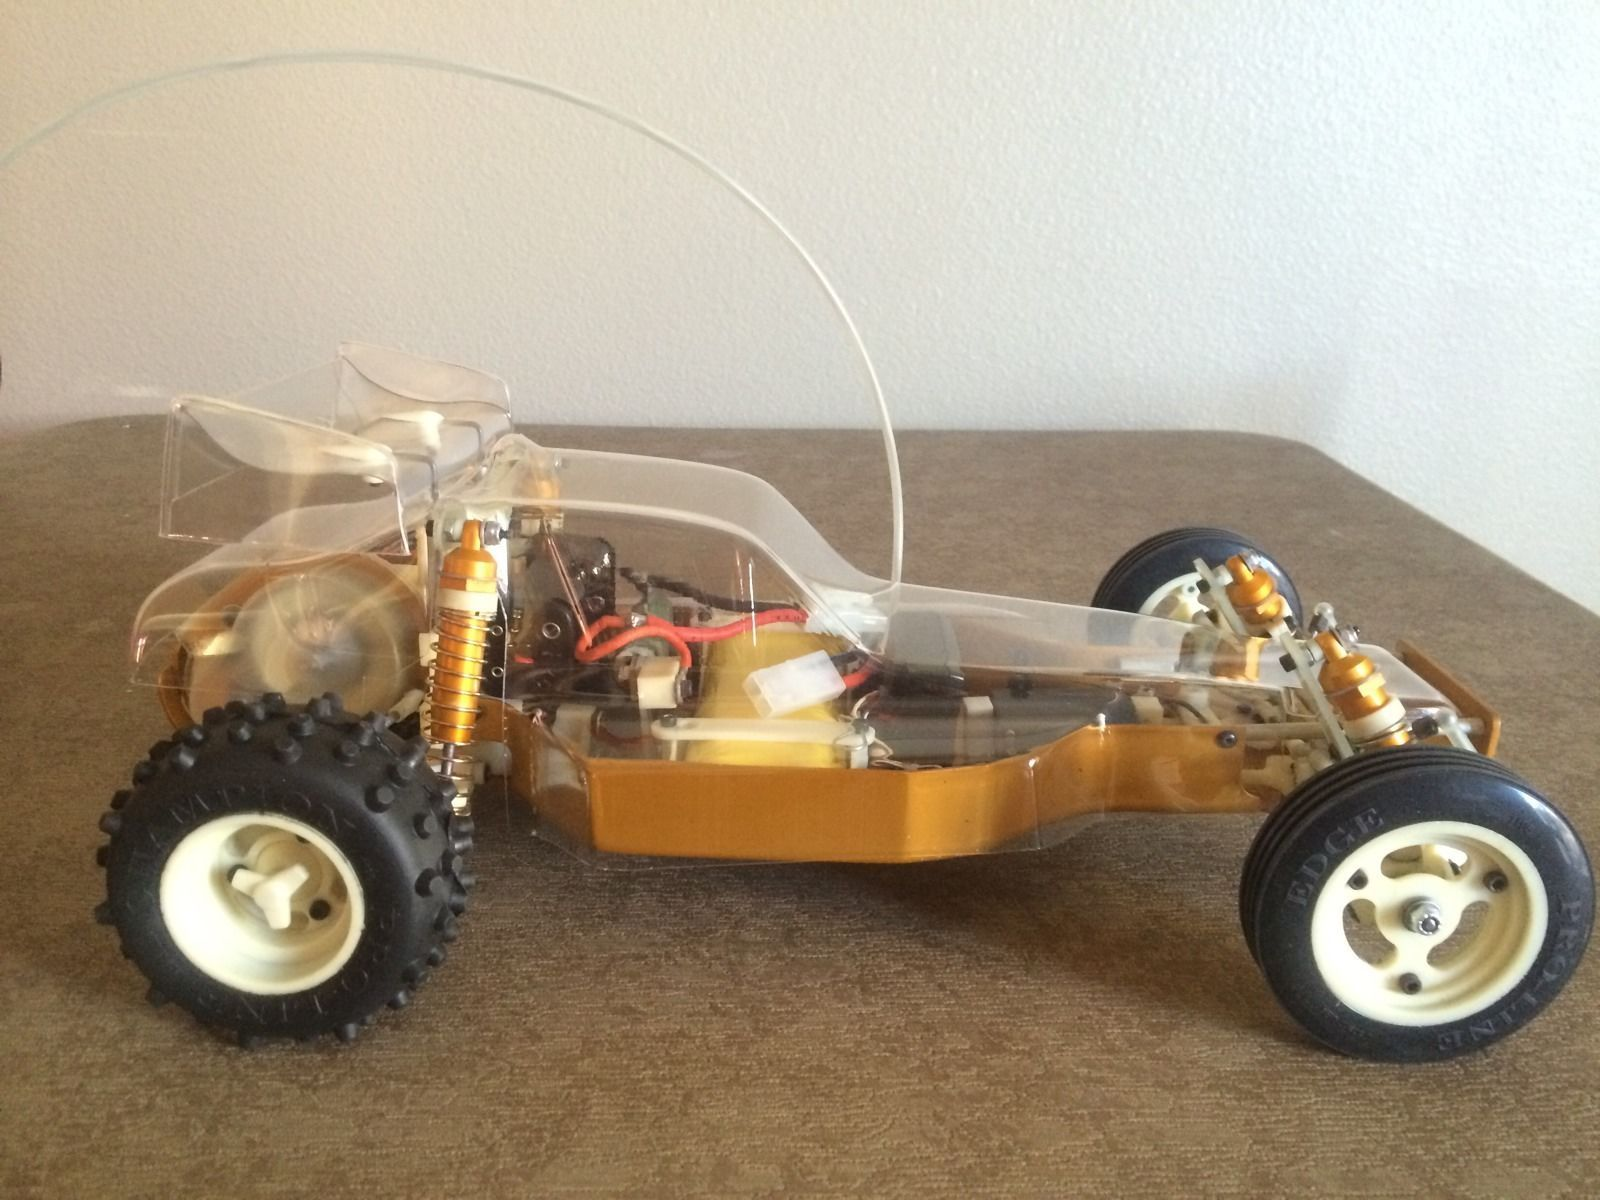 Original Team Associated RC10 6016 Gold Tub Classic Buggy not Reissue   eBay